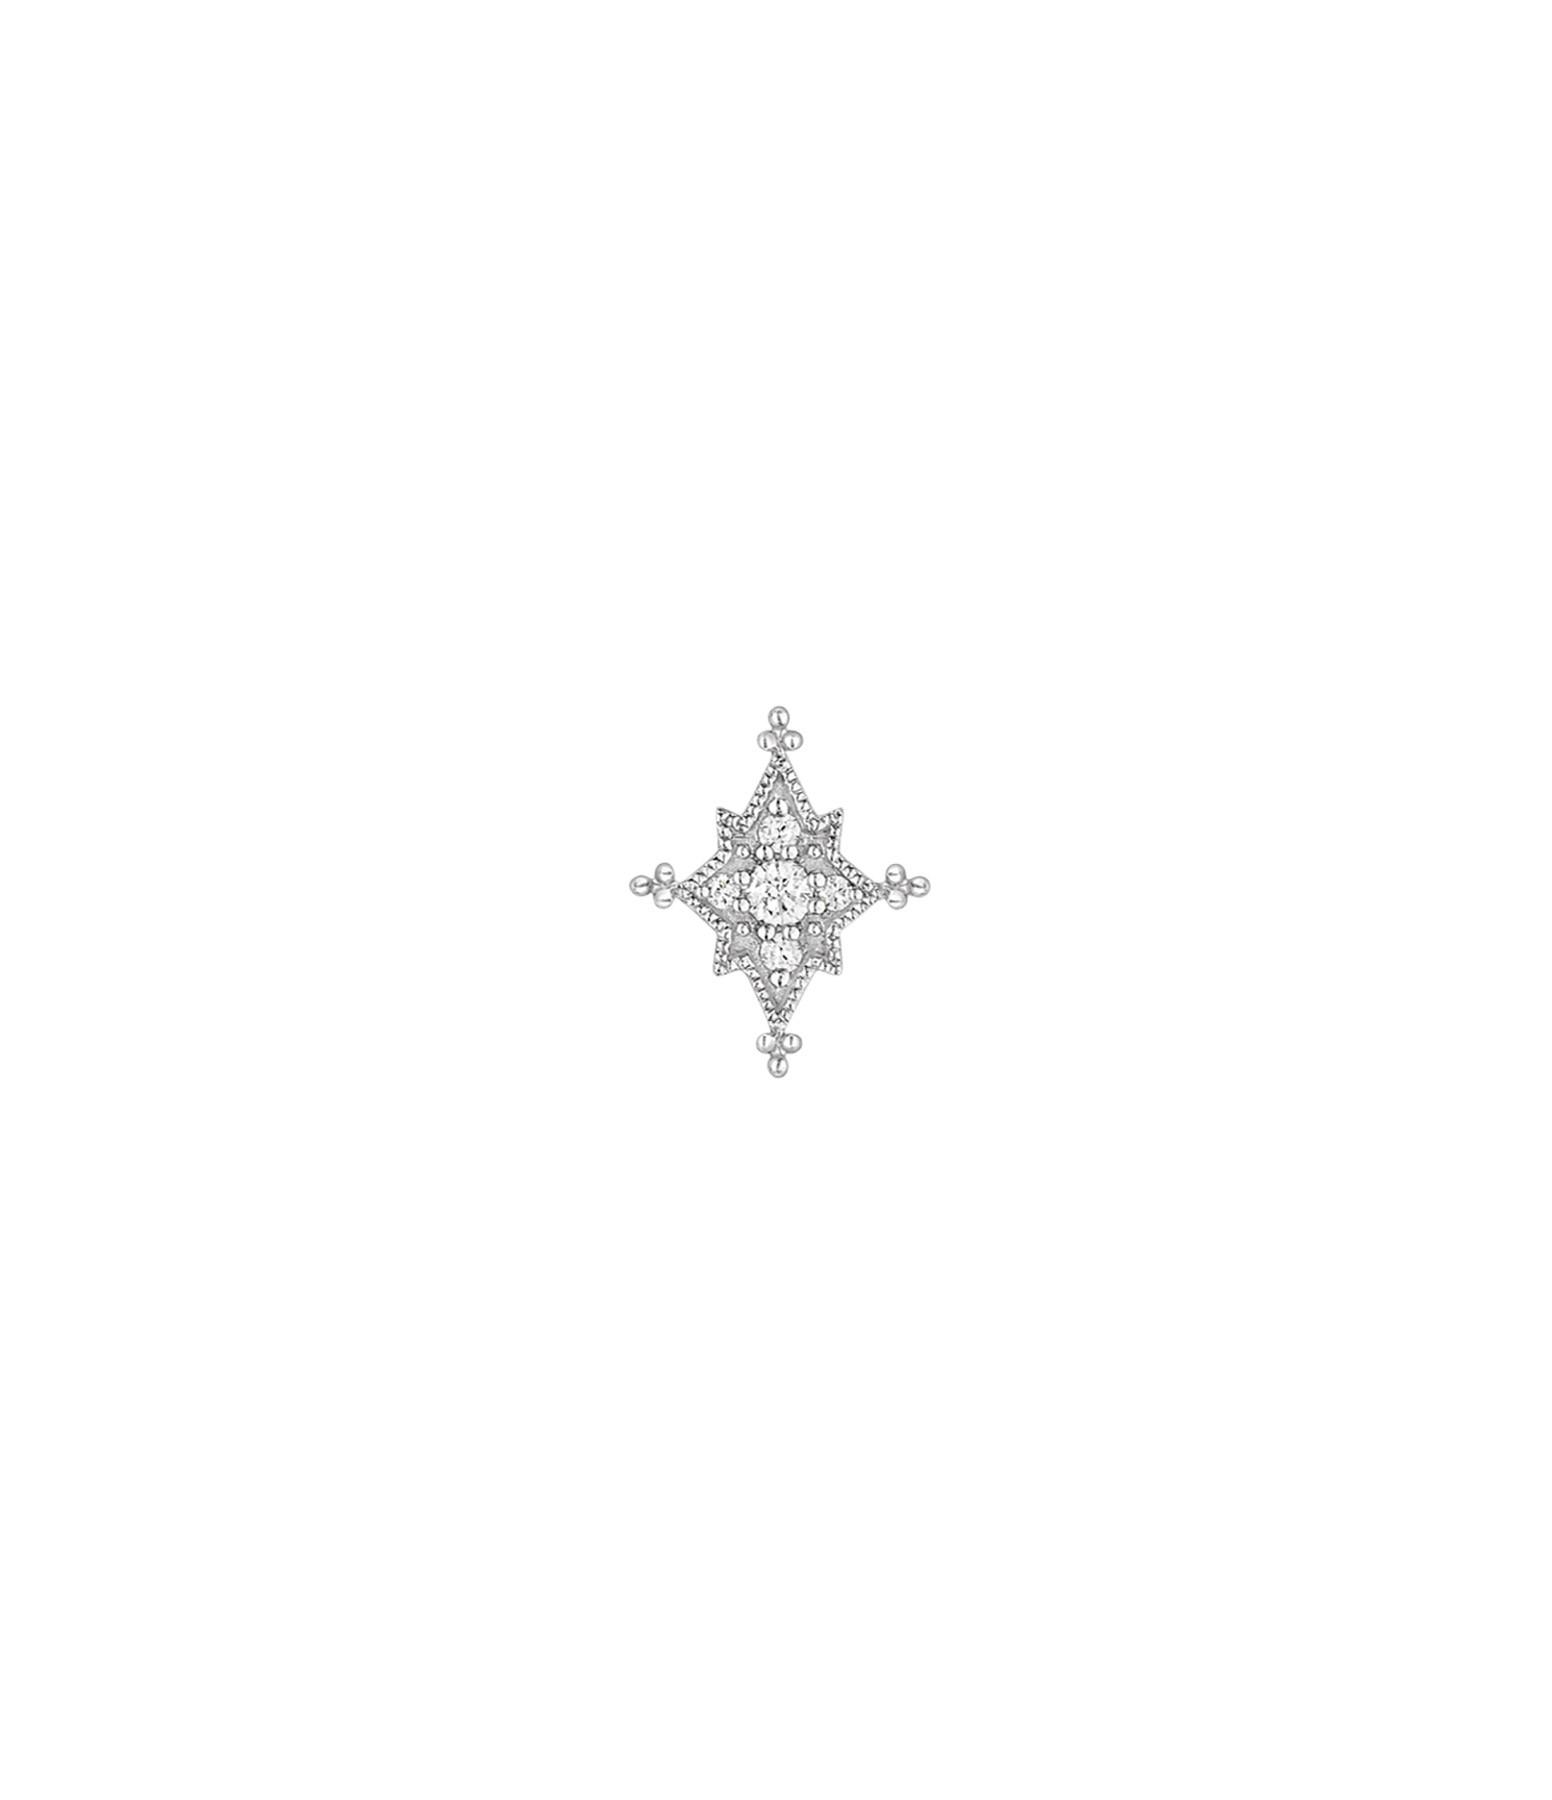 STONE PARIS - Boucle d'oreille Bouton Stella Diamants Or Blanc